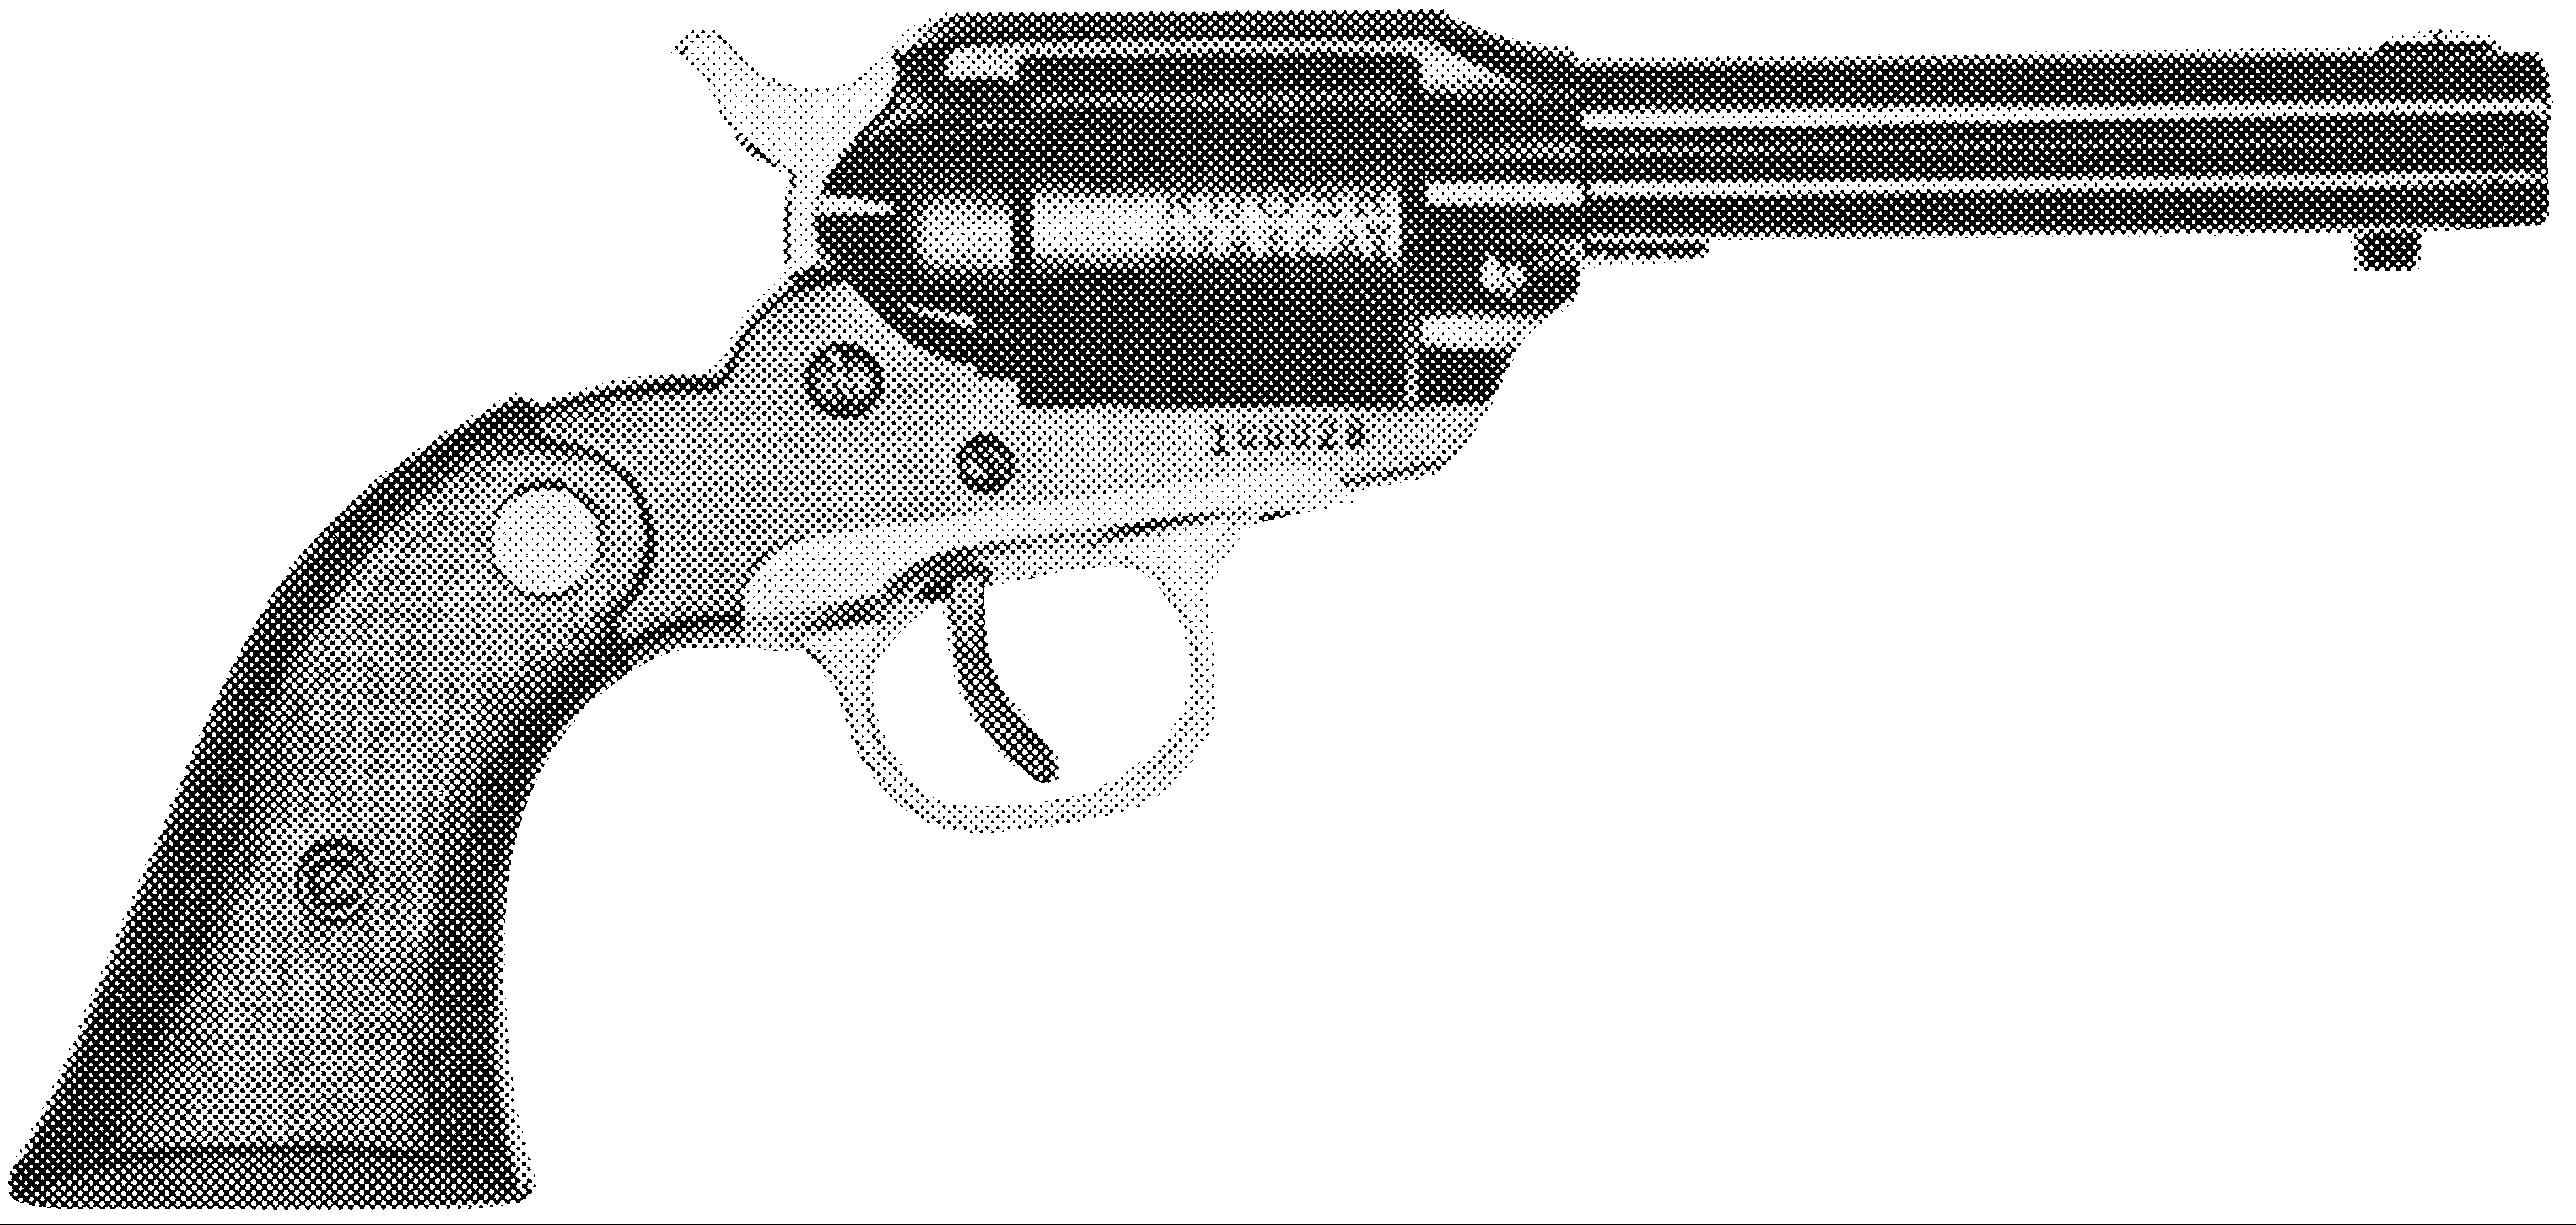 STURM, RUGER & CO  Bearcat (Old Model) :: Gun Values by Gun